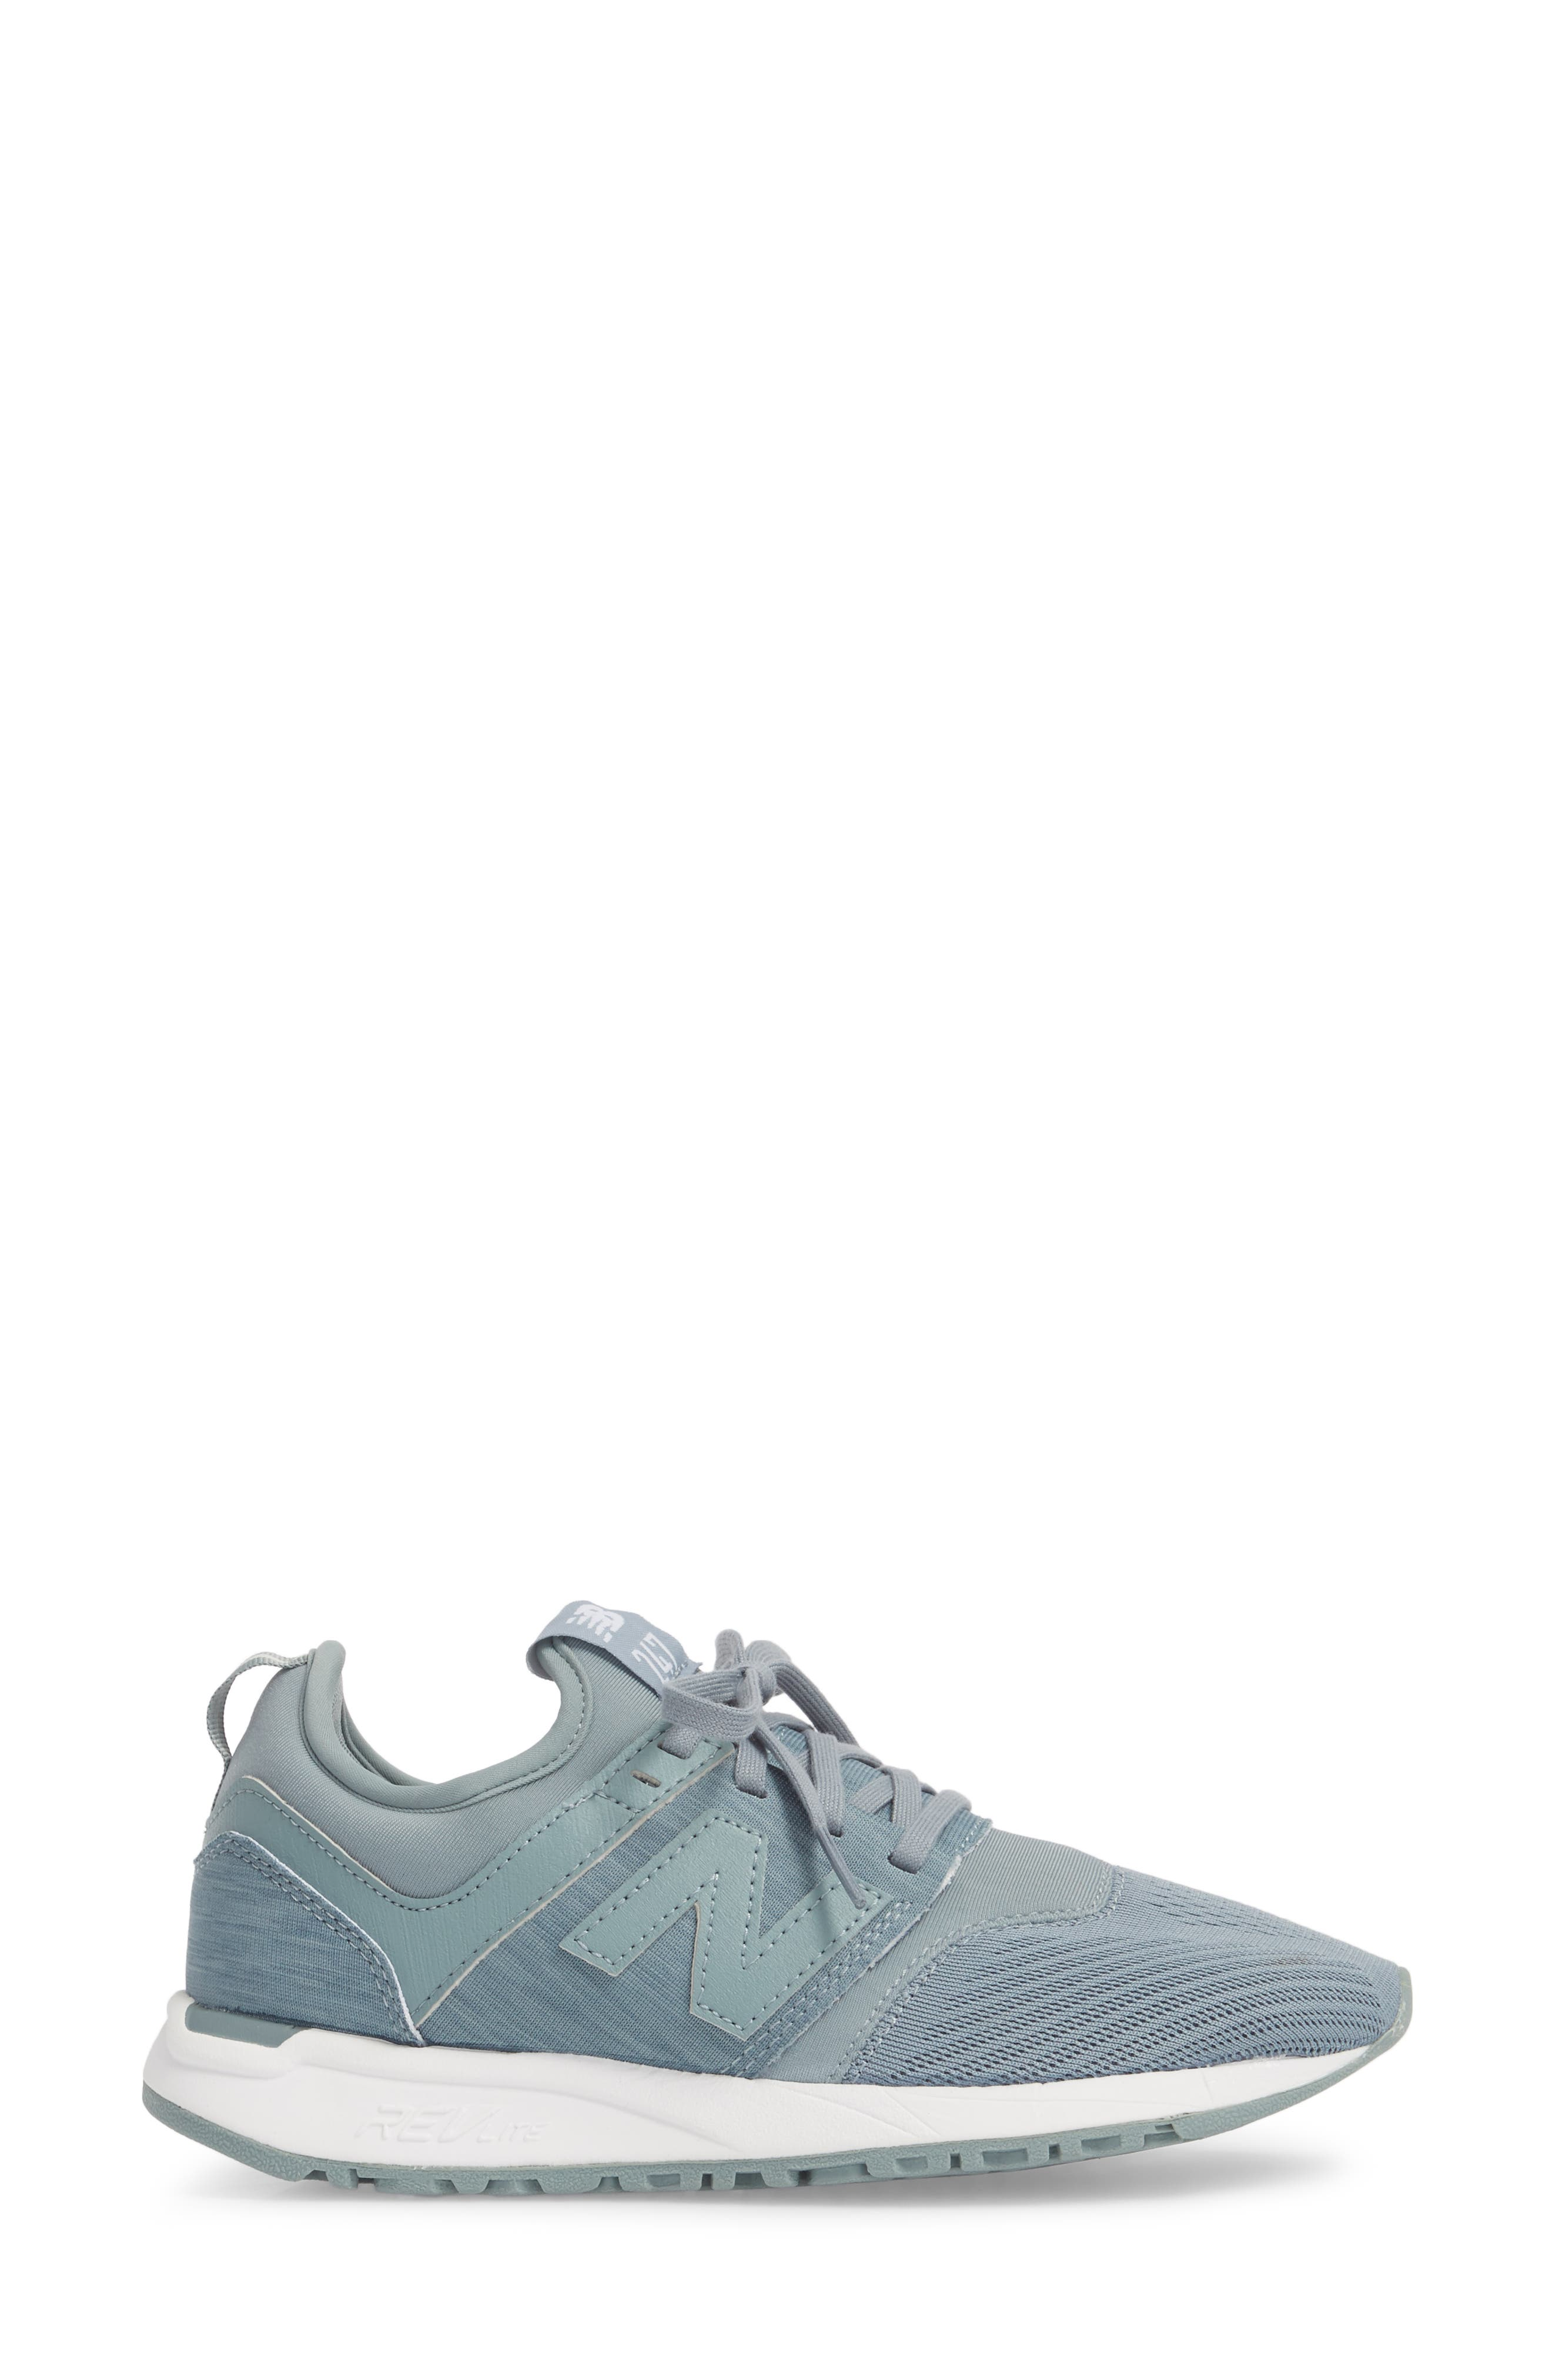 247 Classic Sneaker,                             Alternate thumbnail 5, color,